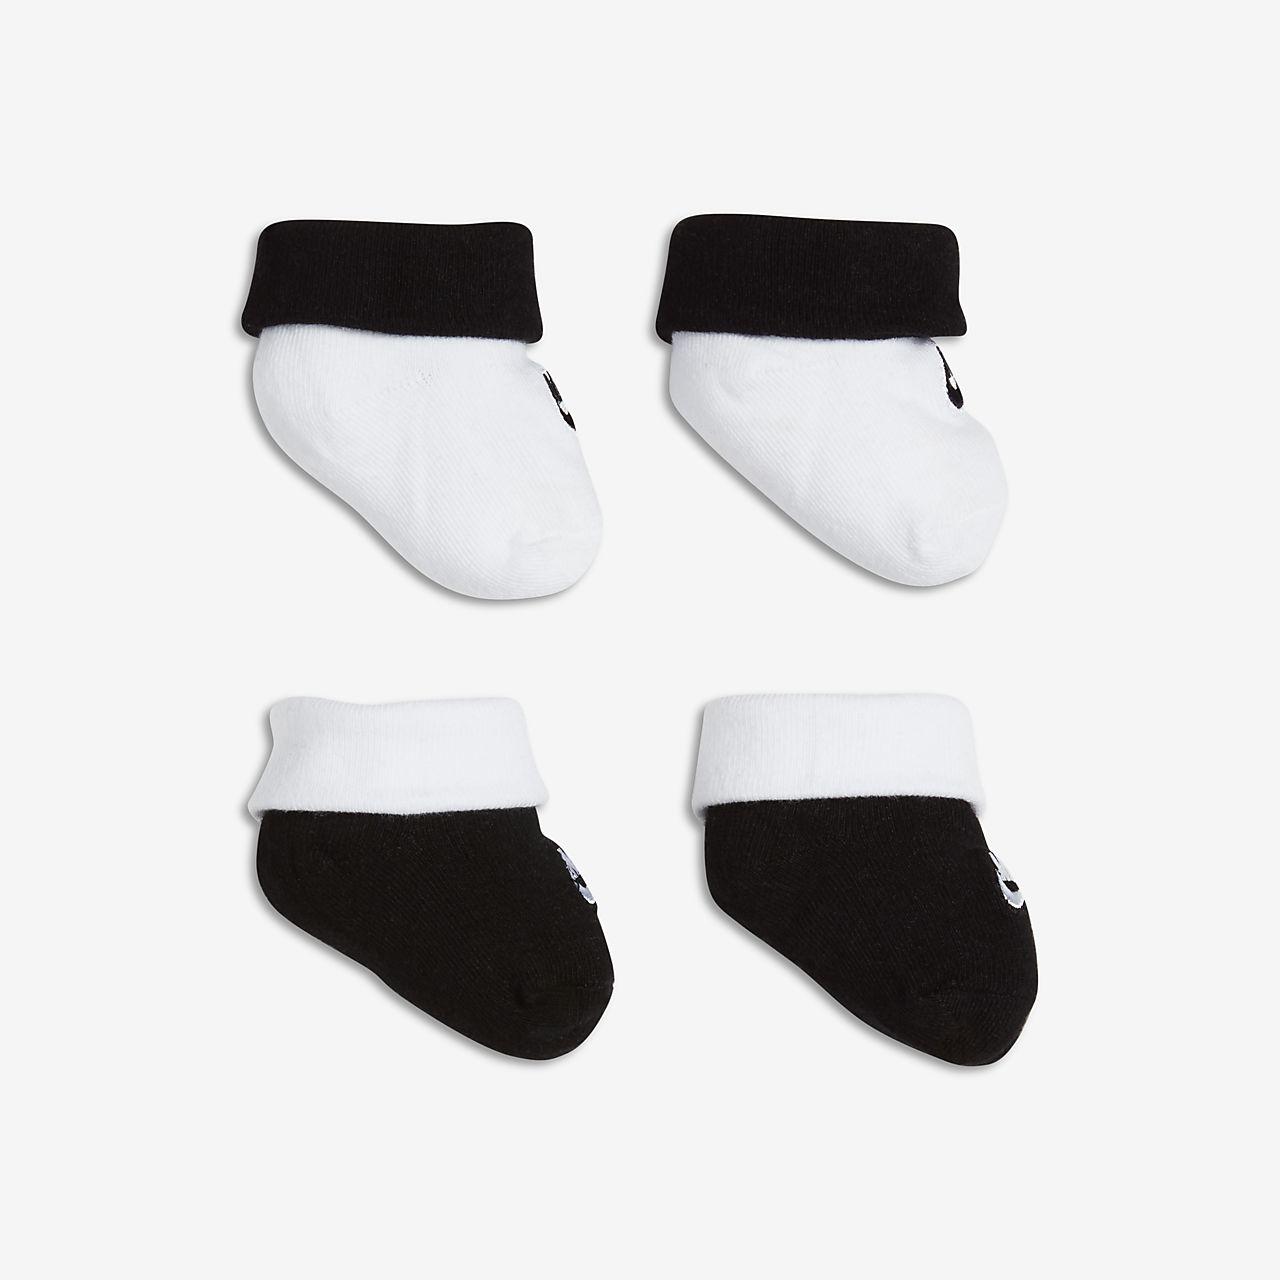 Nike Sportswear Botins (2 parells) - Nadó